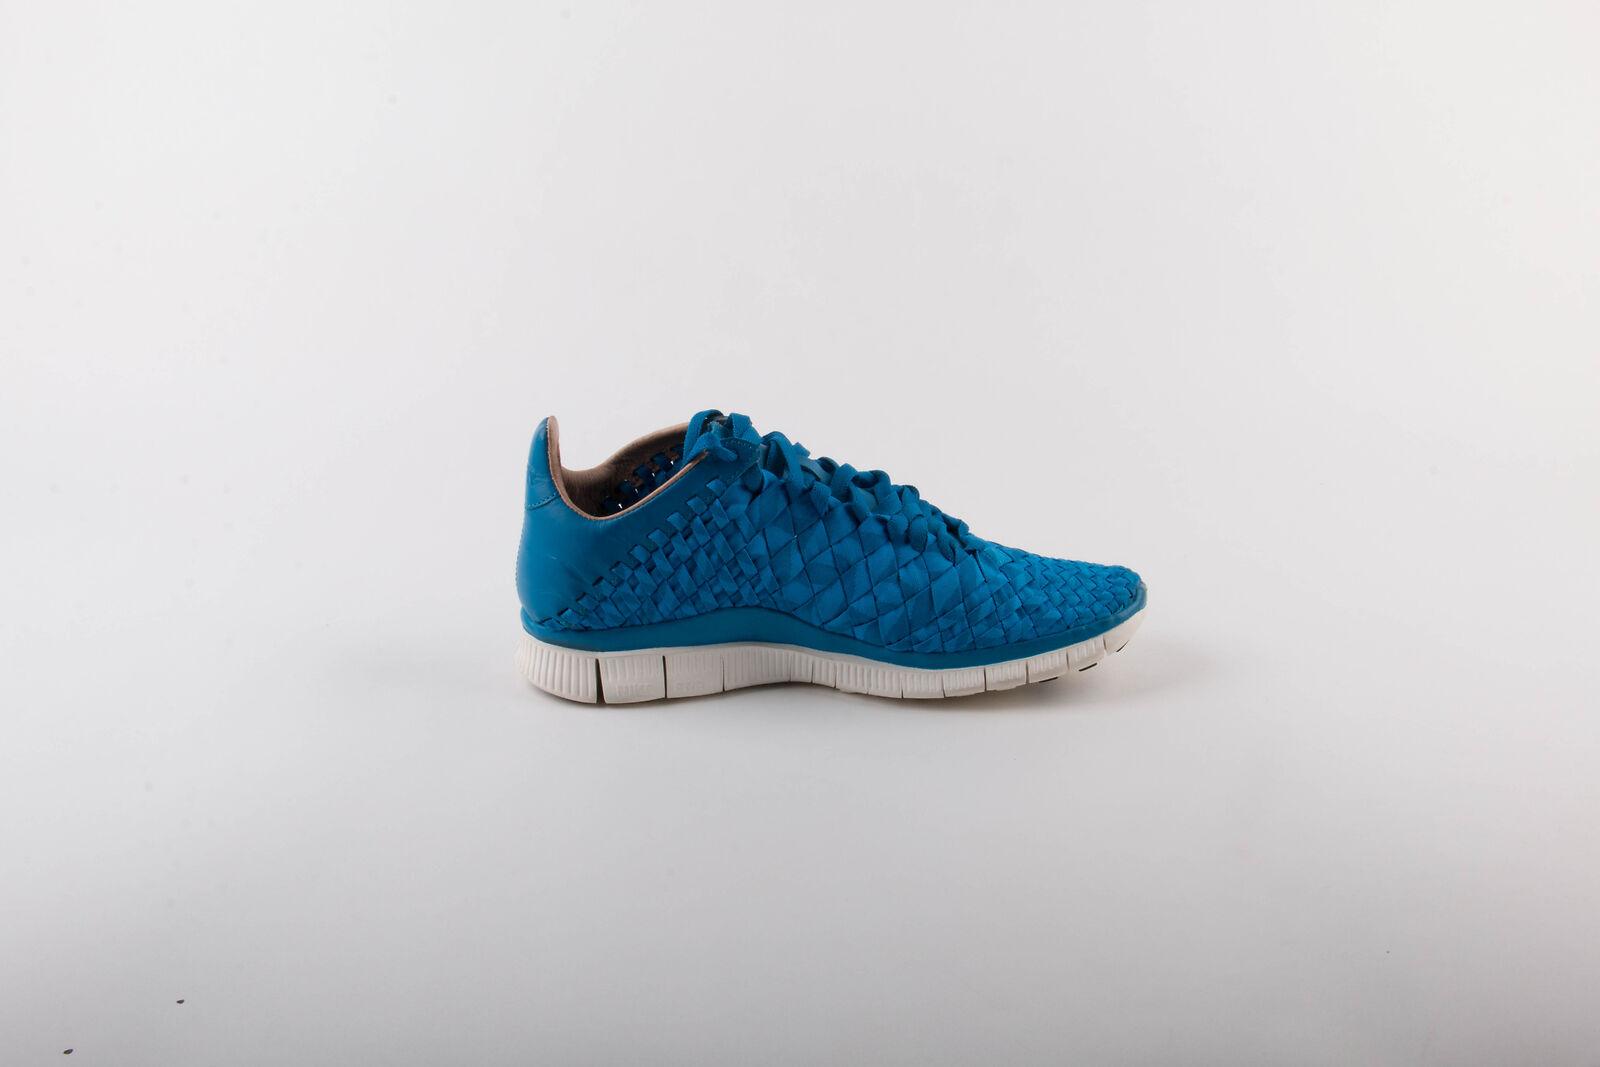 Nike  Uomo Free Blau Inneva Woven SP Photo Blau Free 598384-400 Größe 8.5 Pre-owned 358c90